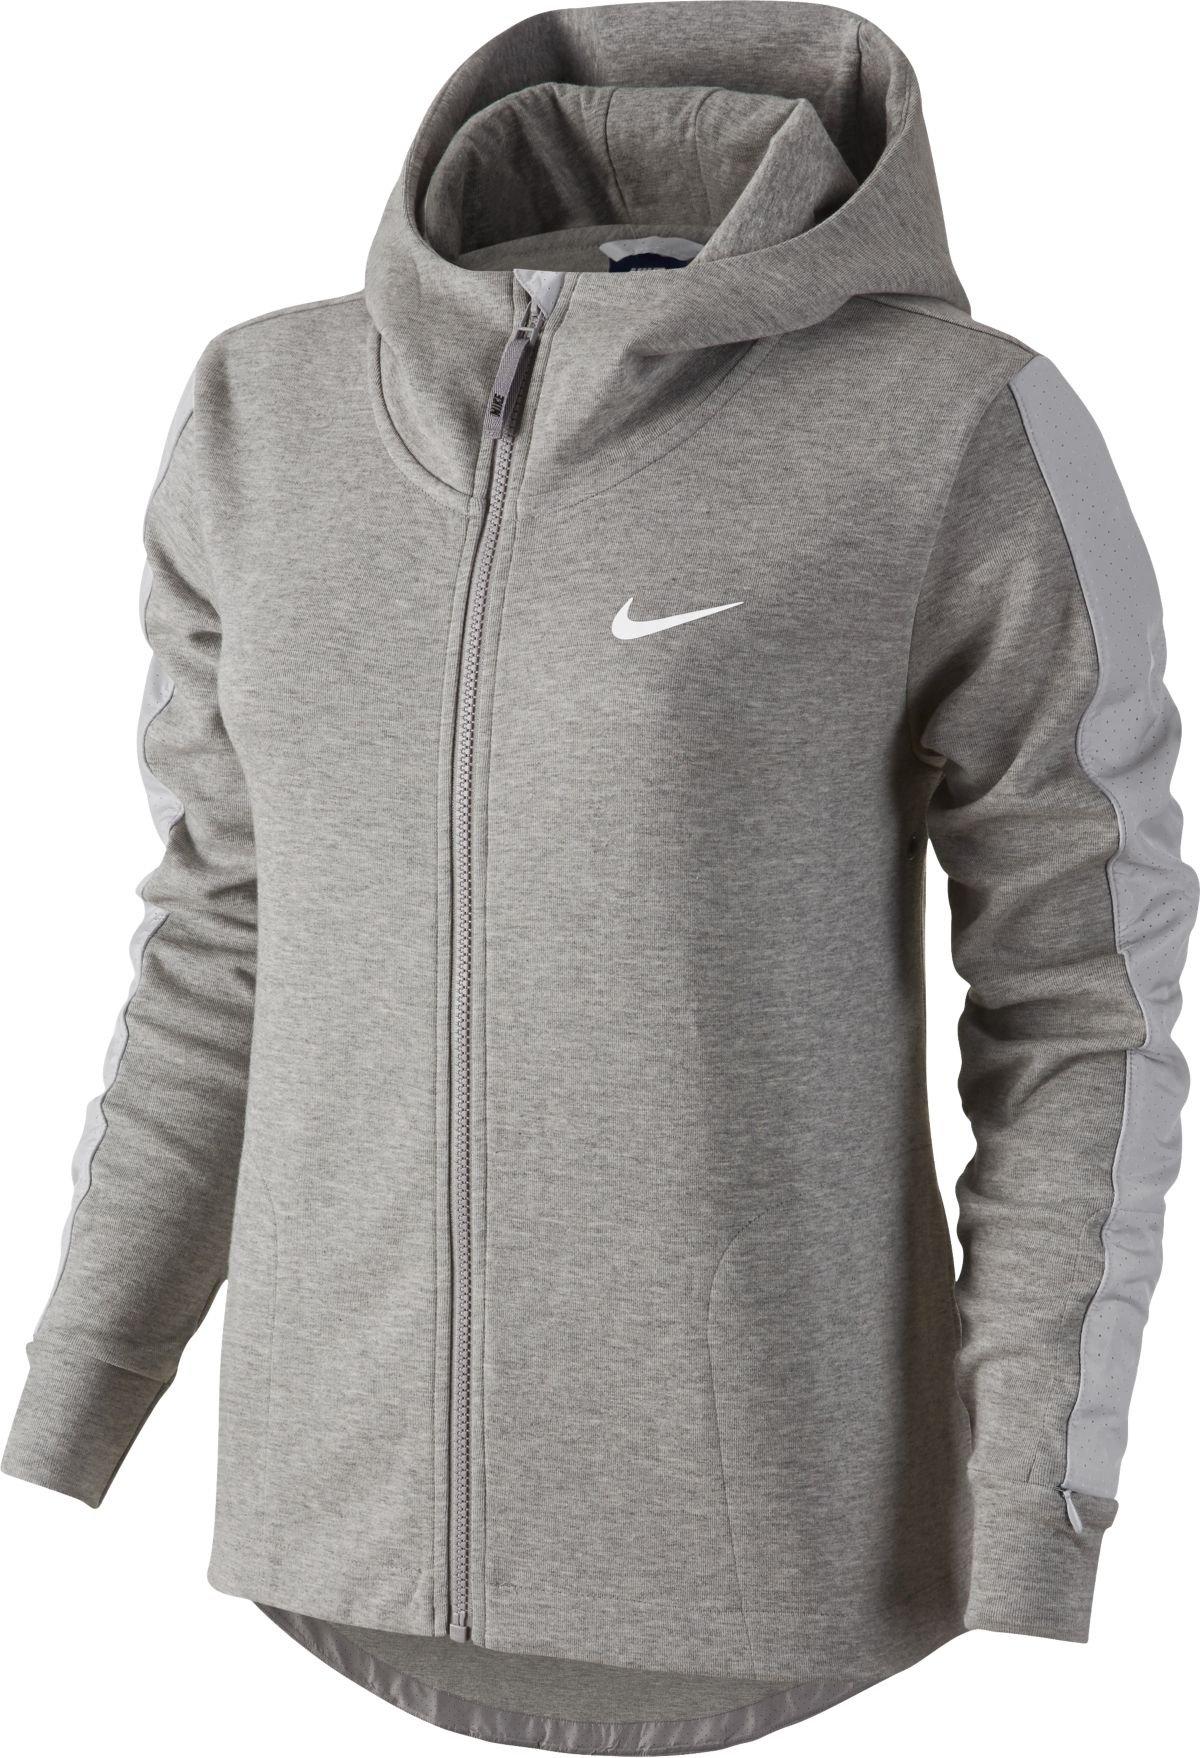 Mikina s kapucí Nike ADVANCE 15 FLEECE CAPE